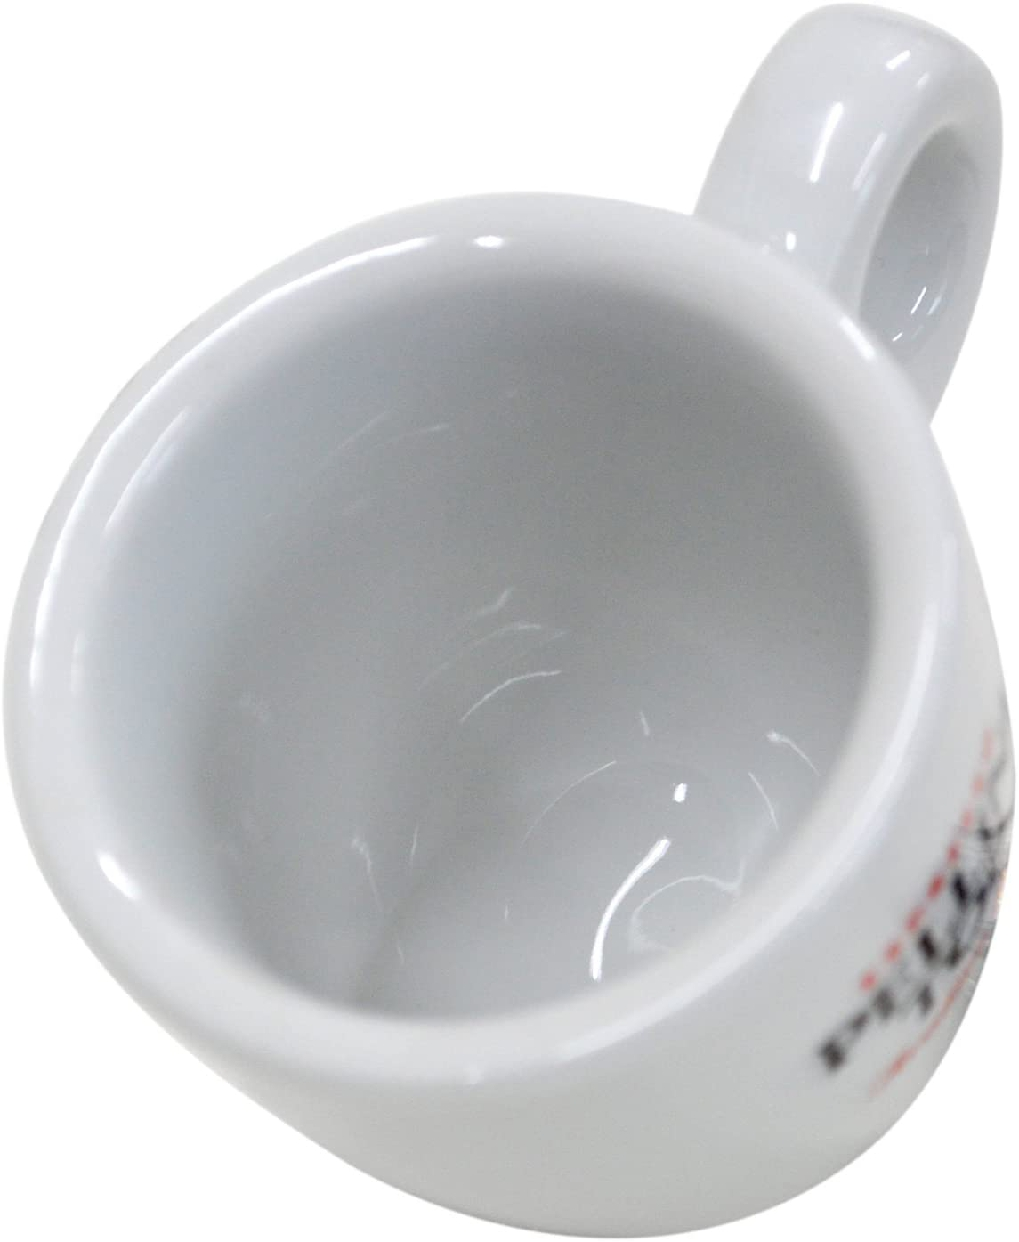 PELLINI(ペリーニ) エスプレッソカップ ヌオバ ソーサー付 1客 PLESCP1の商品画像3